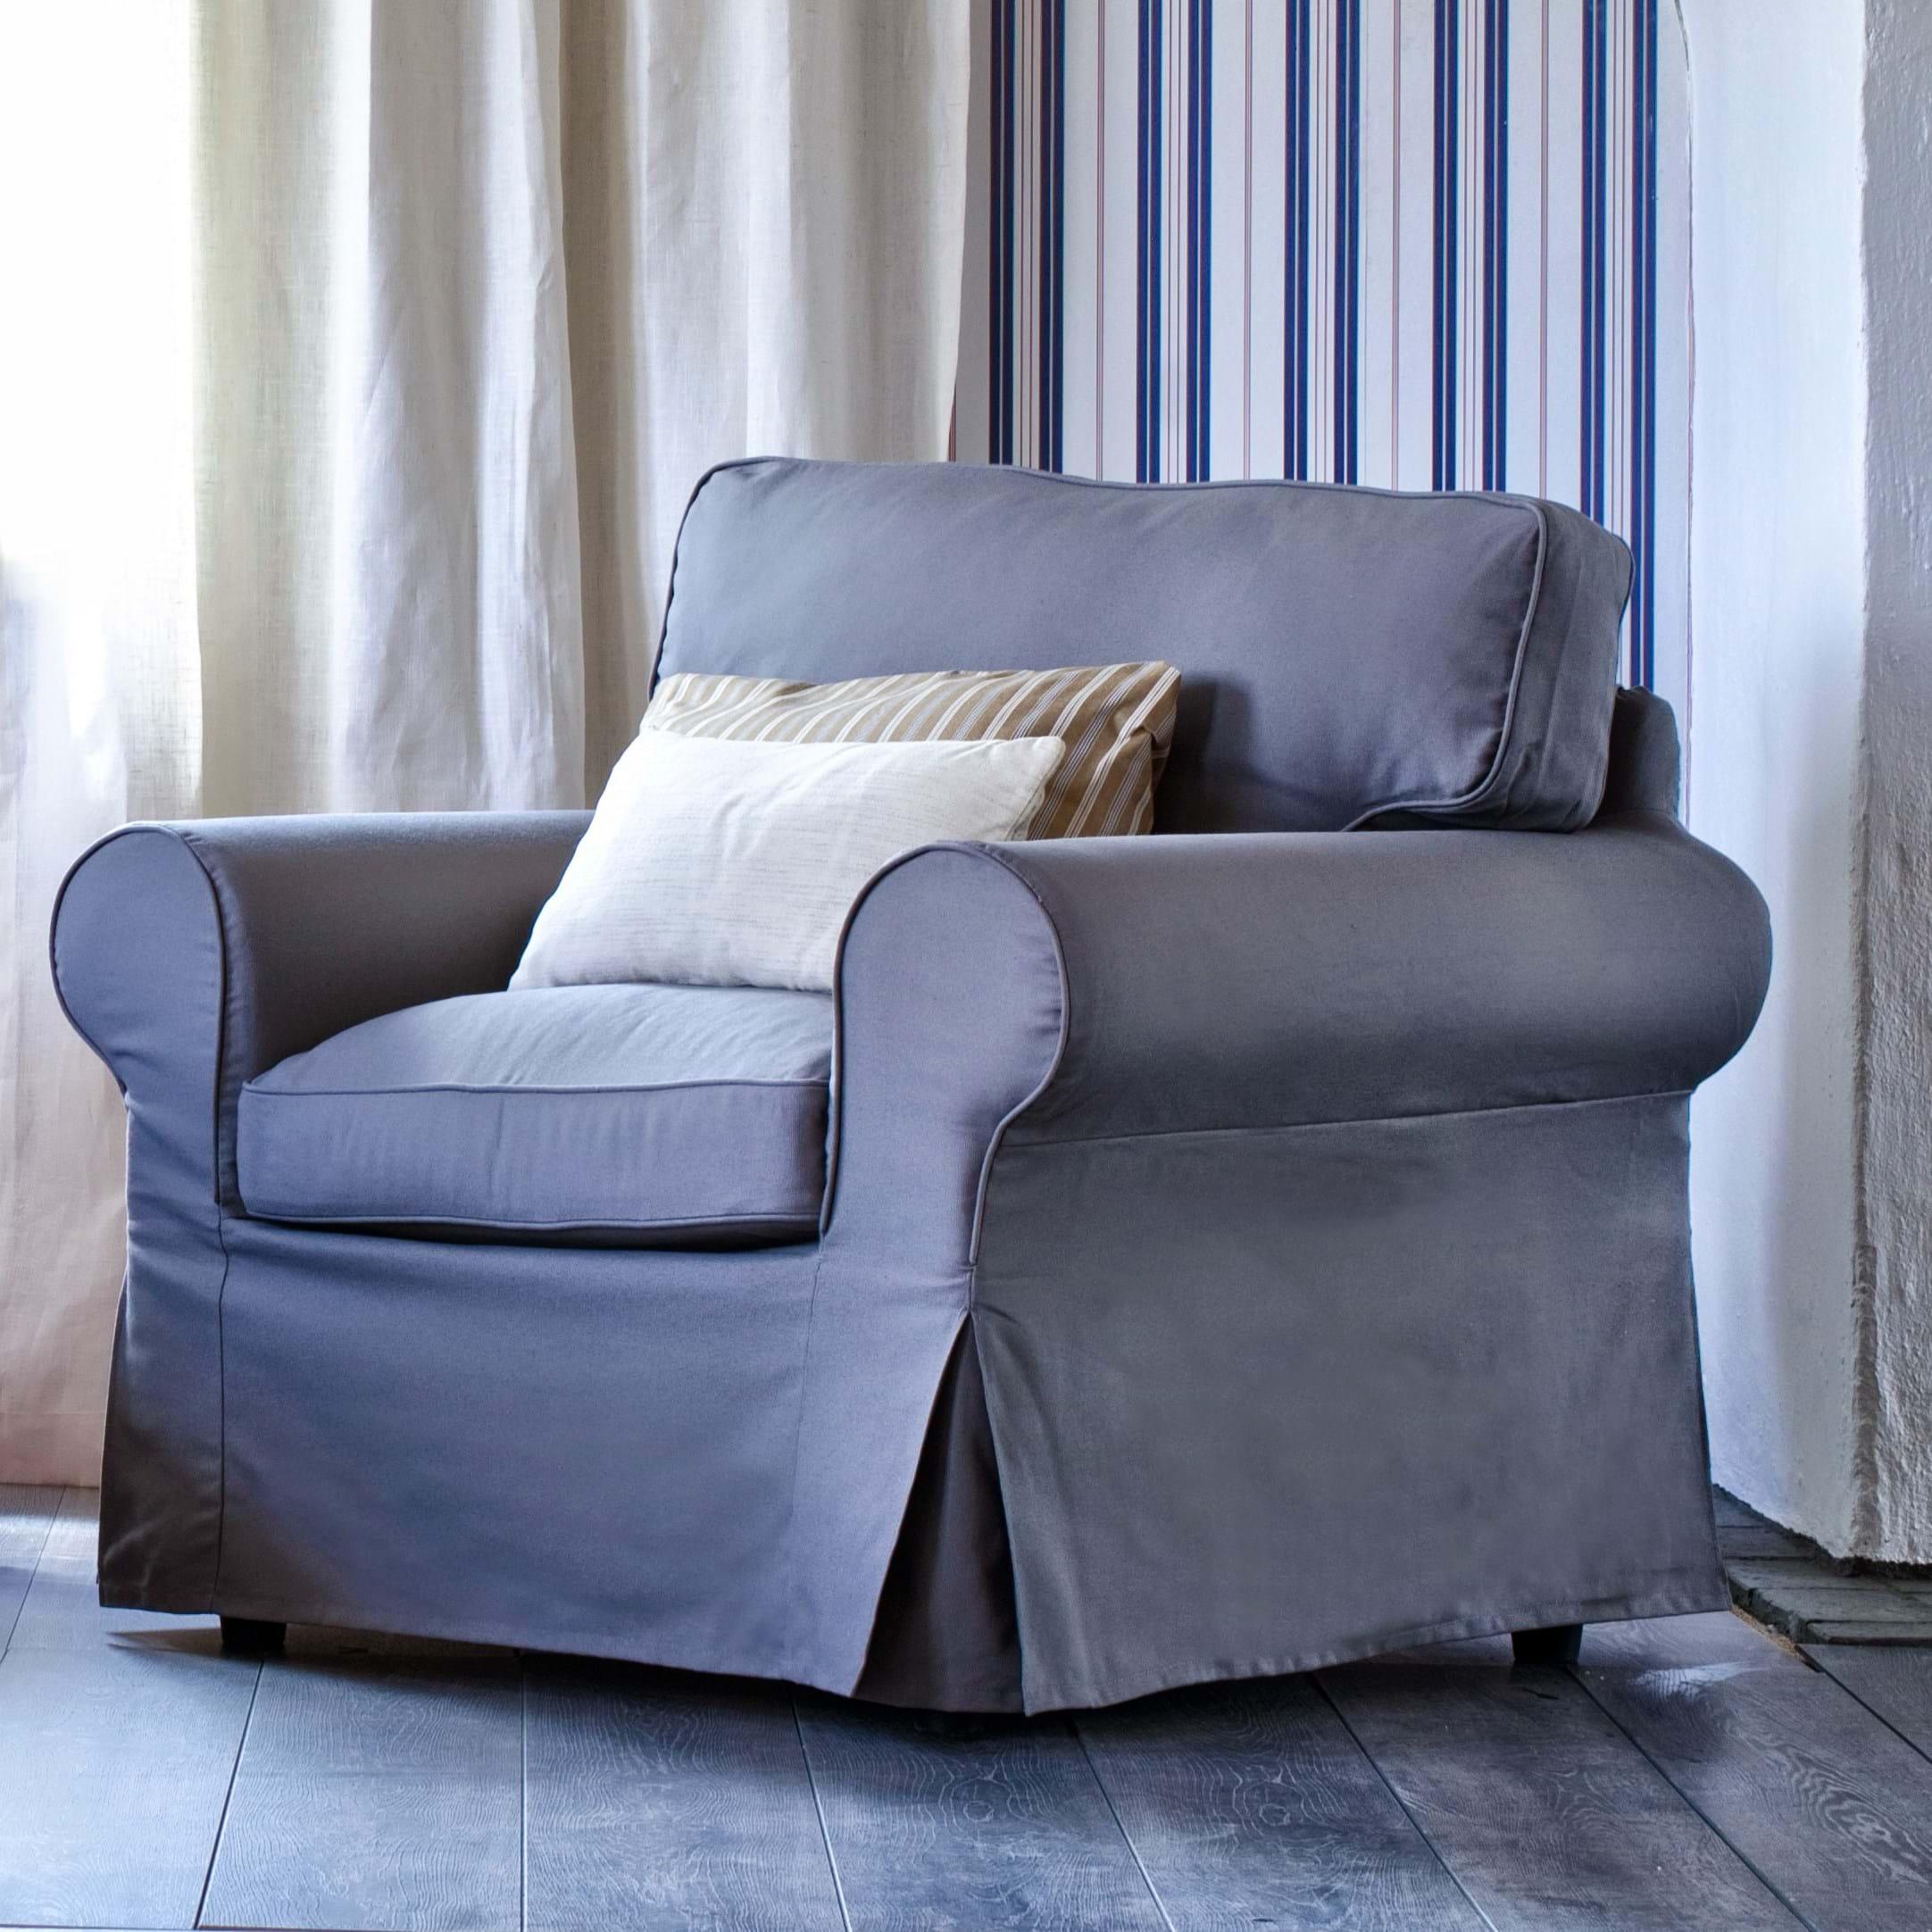 Ikea Sillones Tela